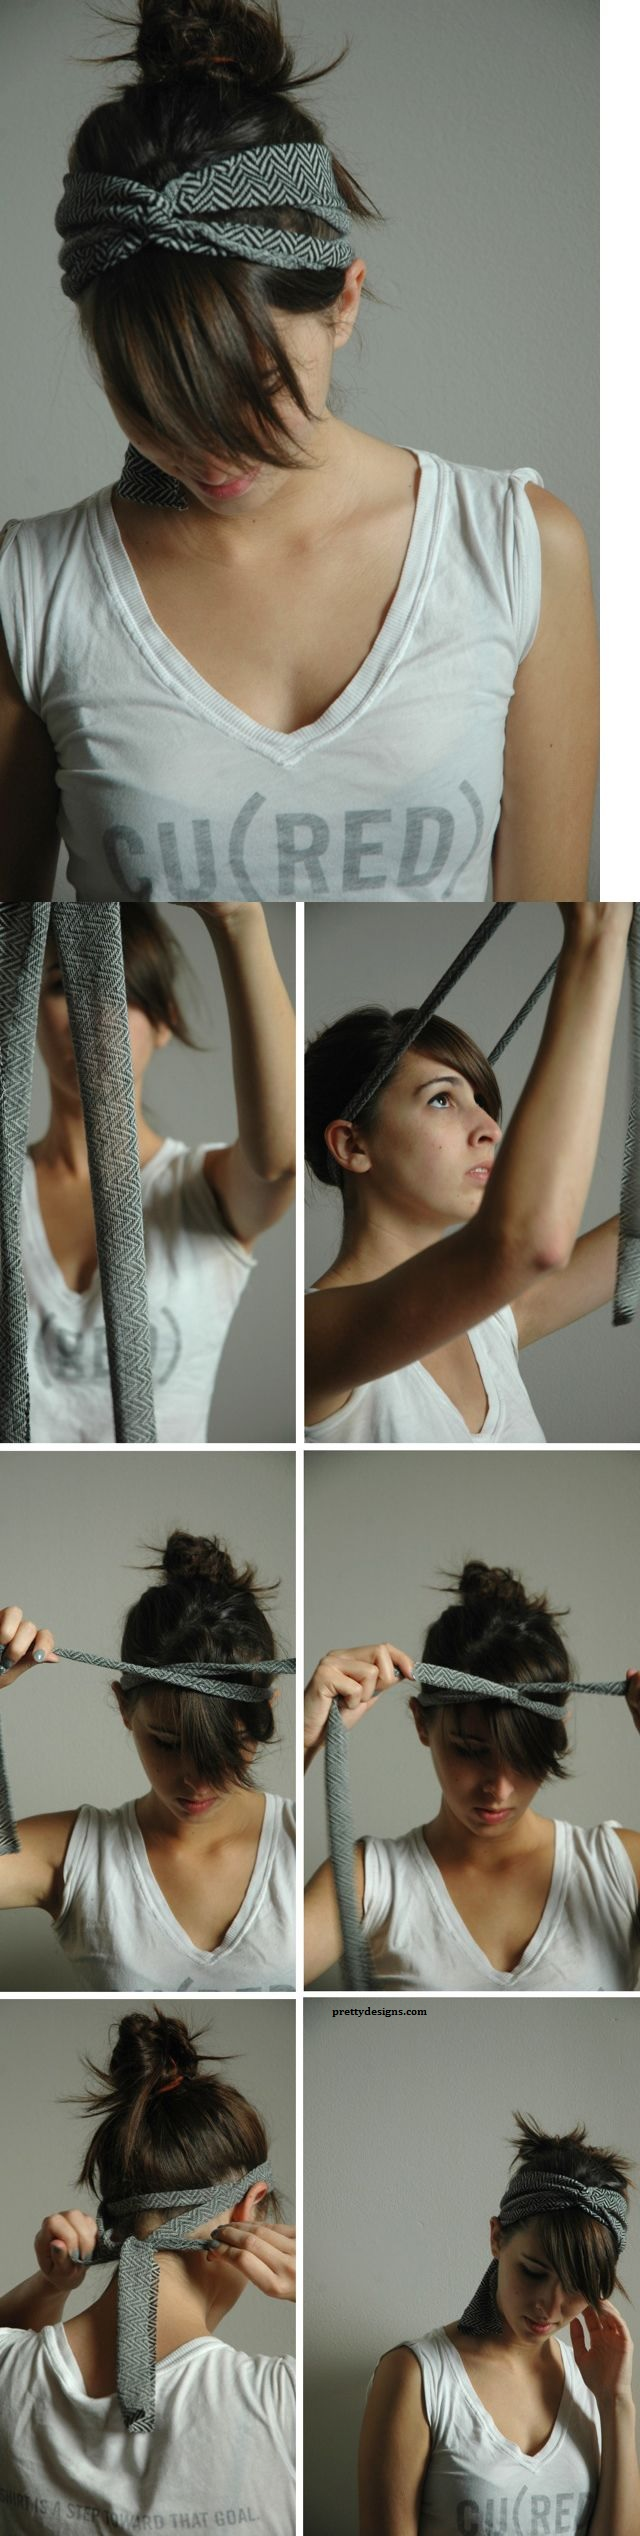 coiffure-avec-frange-11